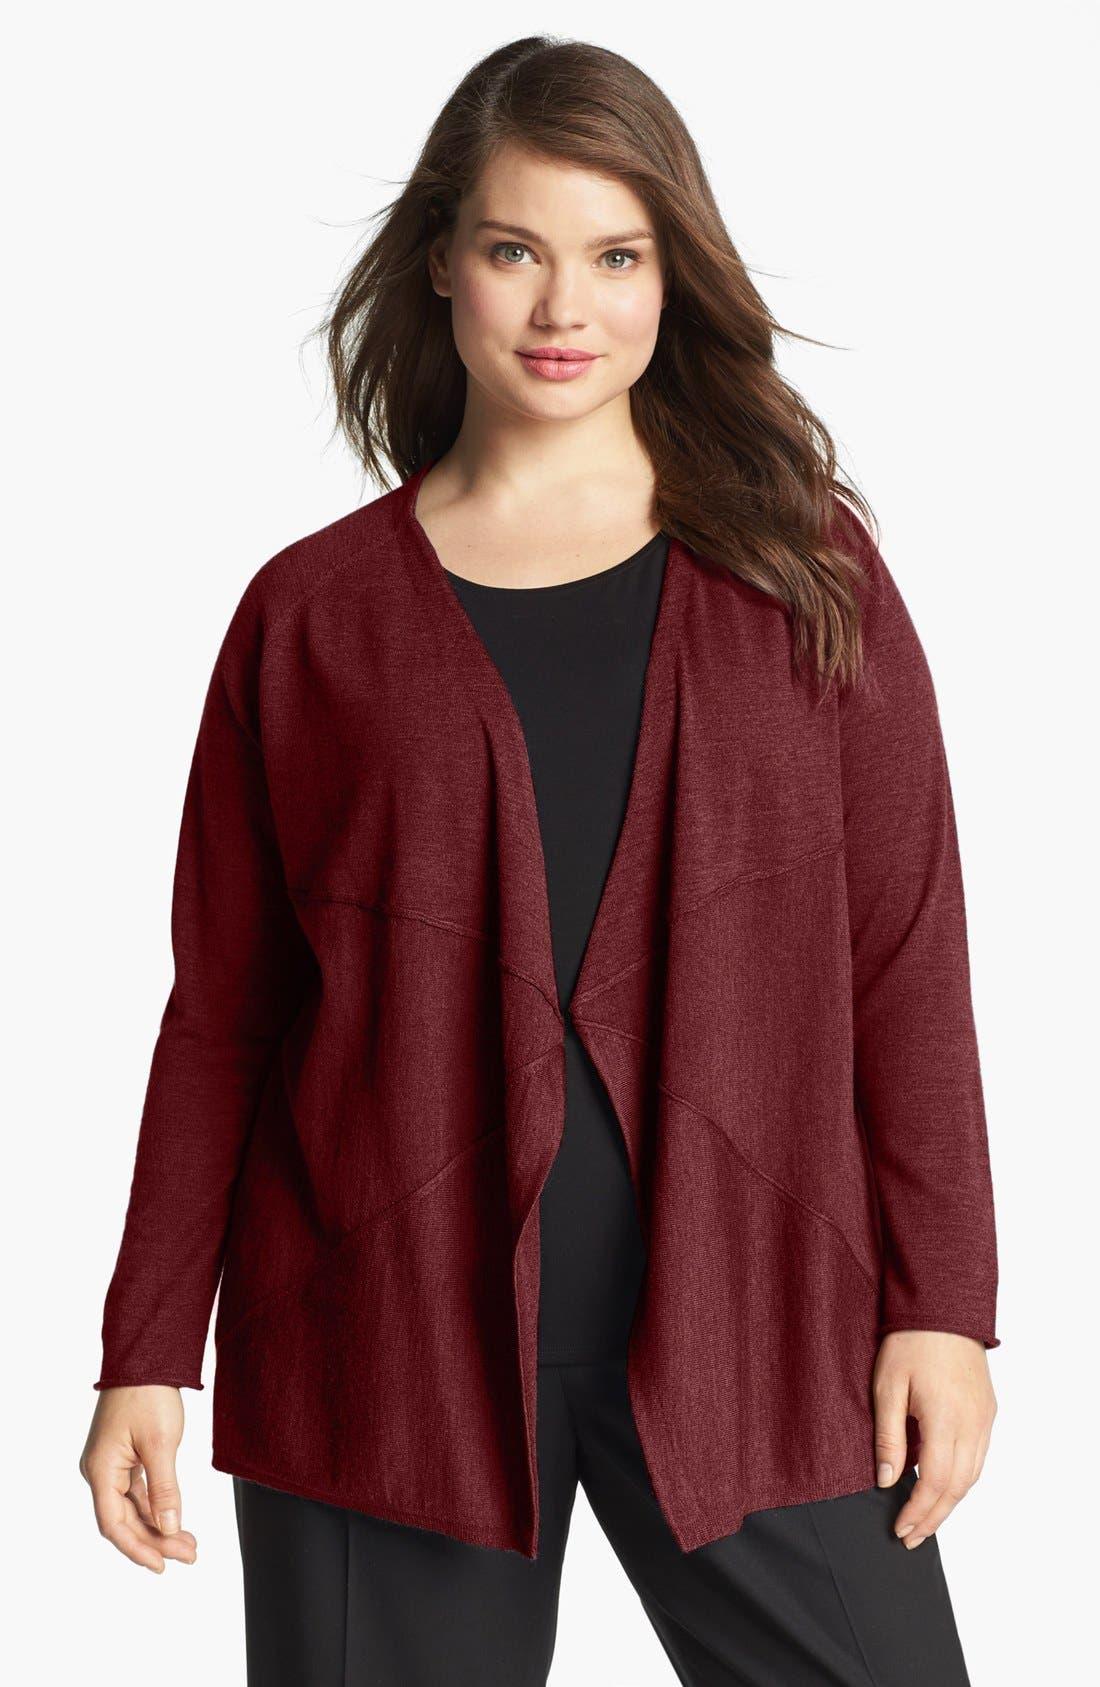 Alternate Image 1 Selected - Eileen Fisher Merino Wool Open Cardigan (Plus Size)